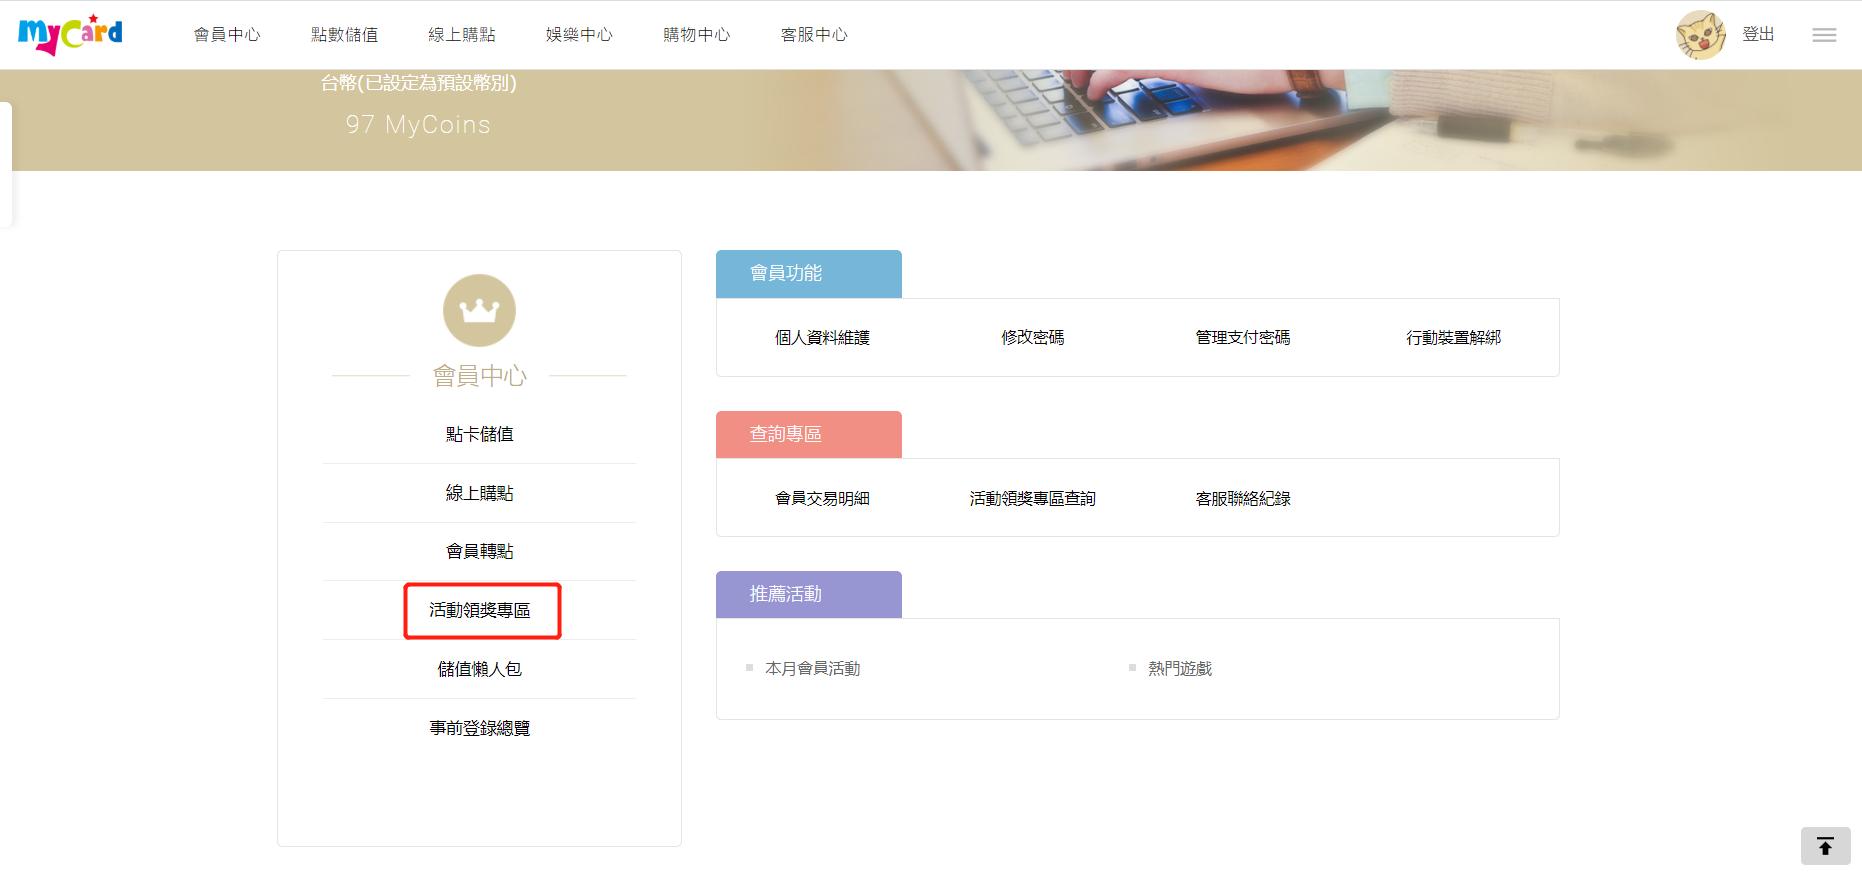 Mycard储值活动详细流程指南-活动领奖专区.png